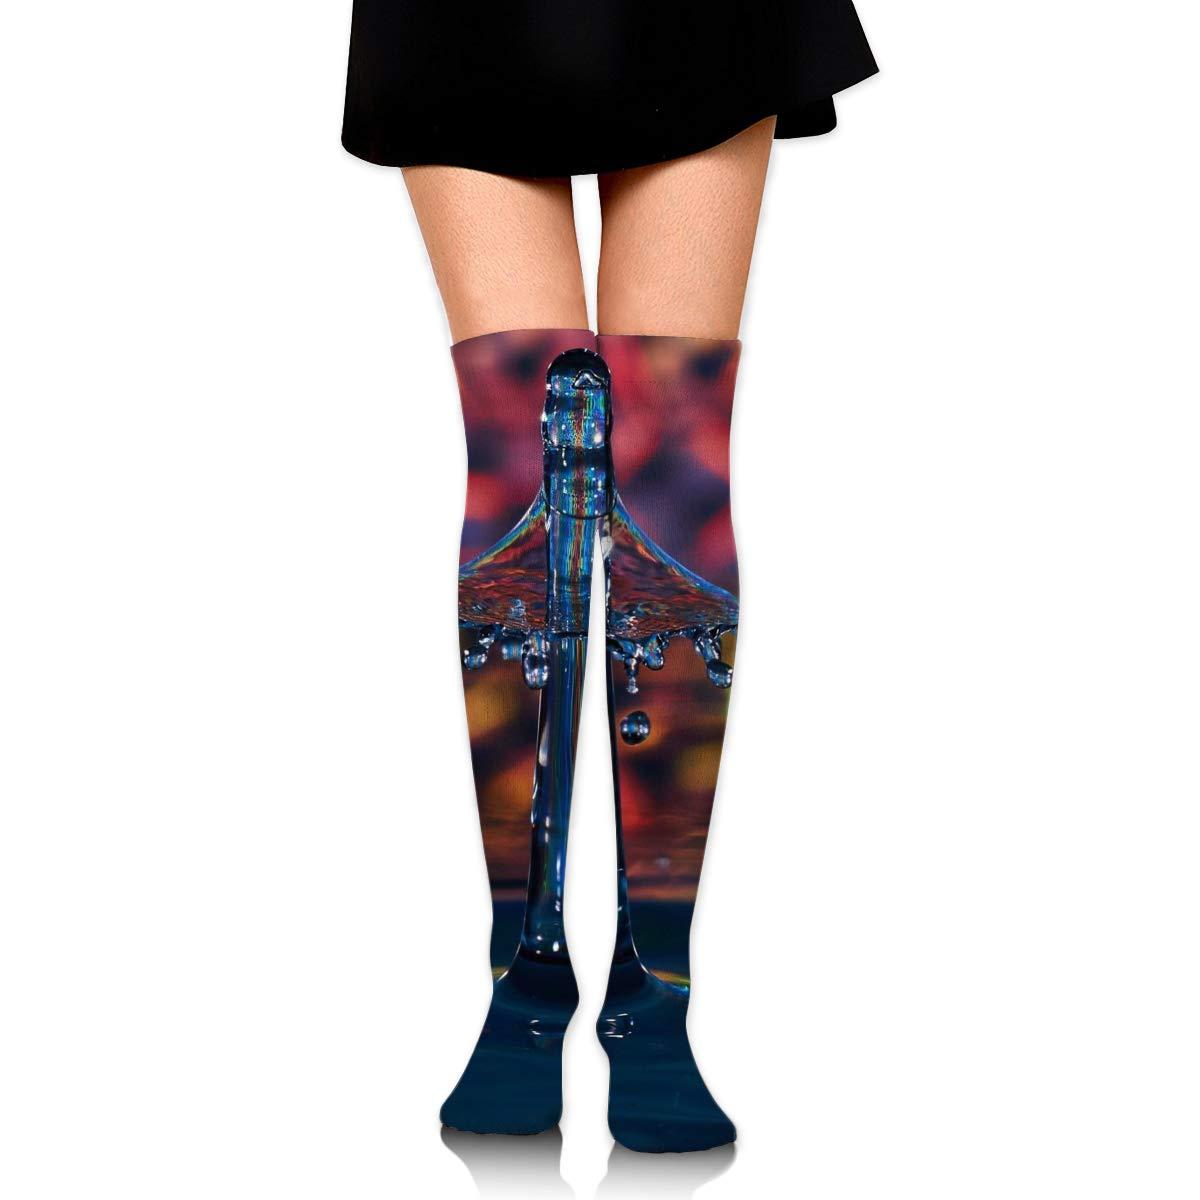 High Elasticity Girl Cotton Knee High Socks Uniform Splashed Watre Women Tube Socks